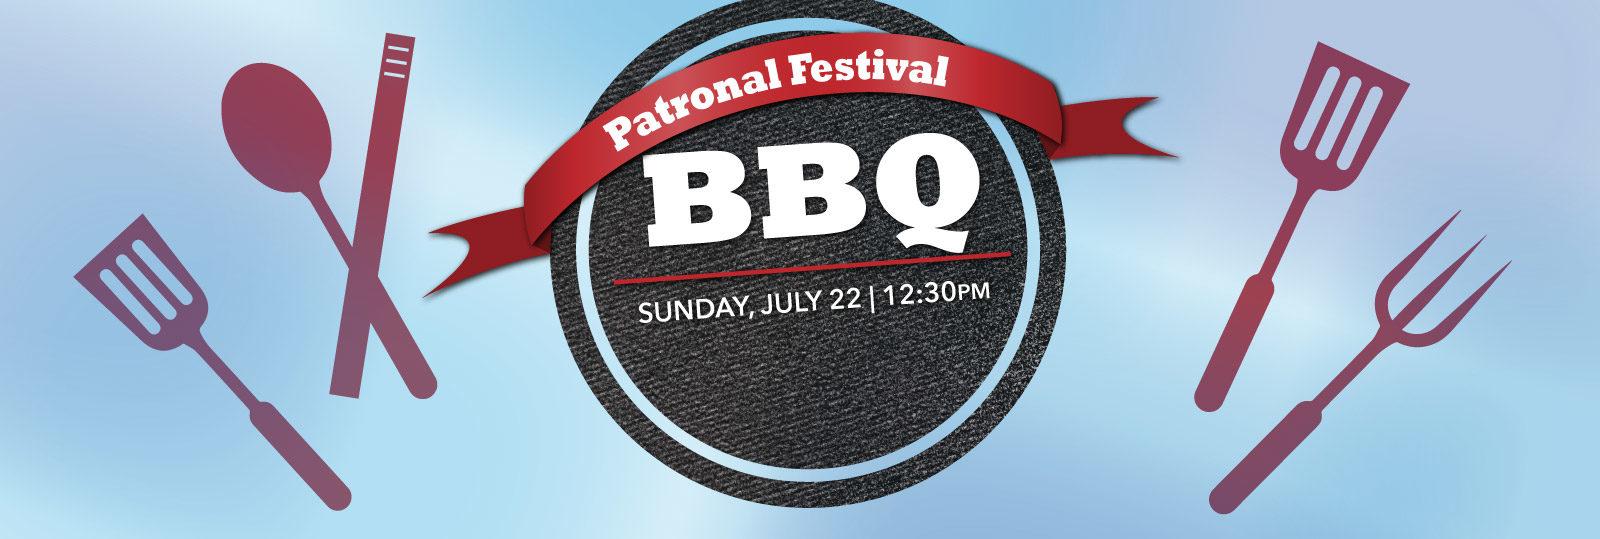 St. James Patronal Festival BBQ